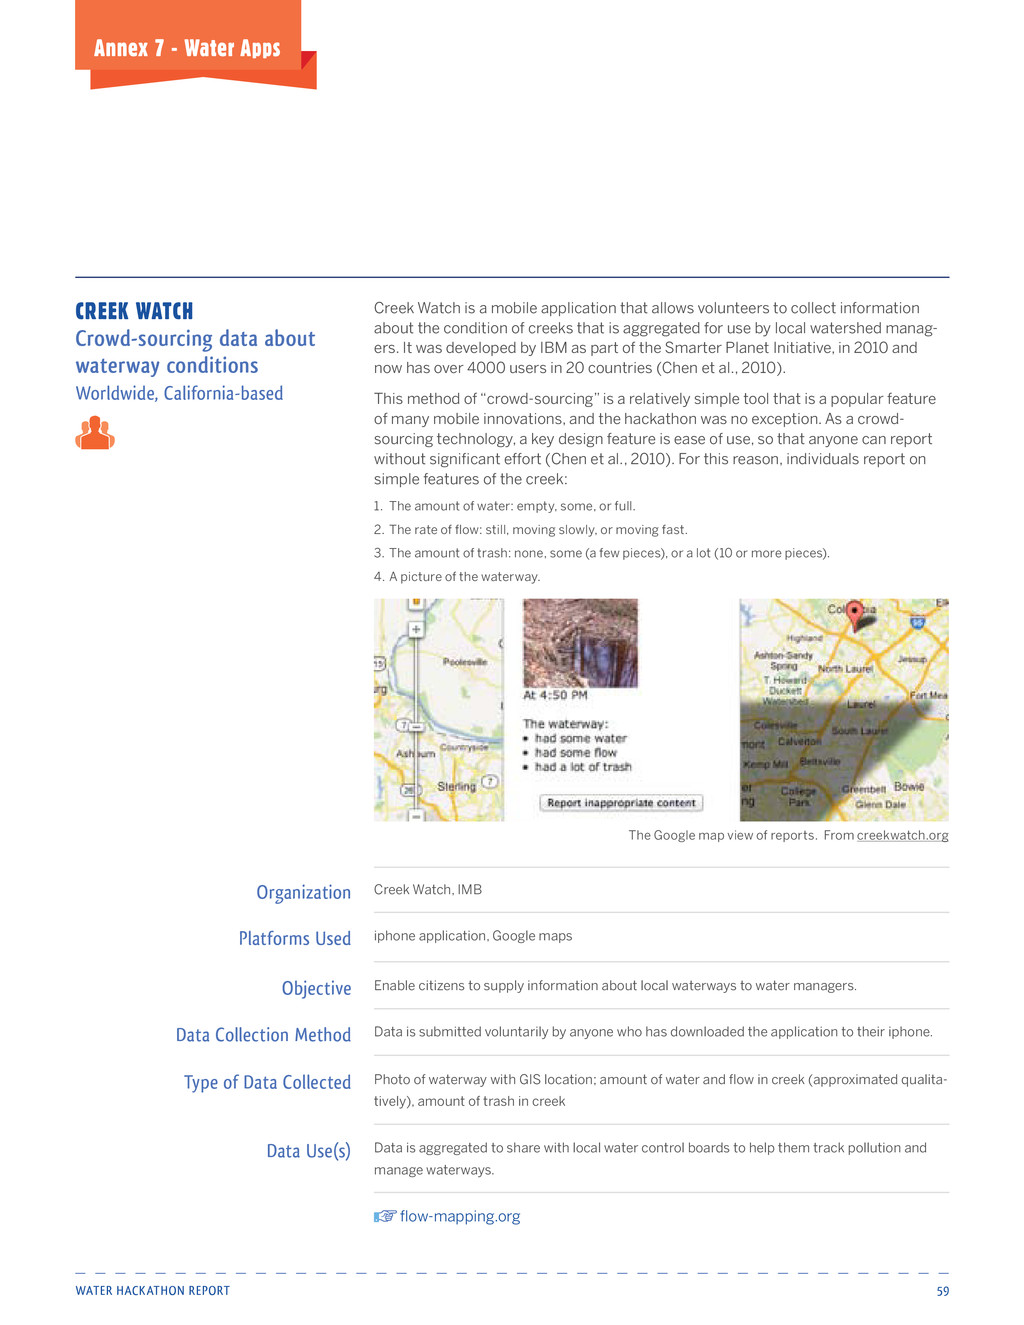 Water HackatHon report 59 Annex 7 - water Apps ...